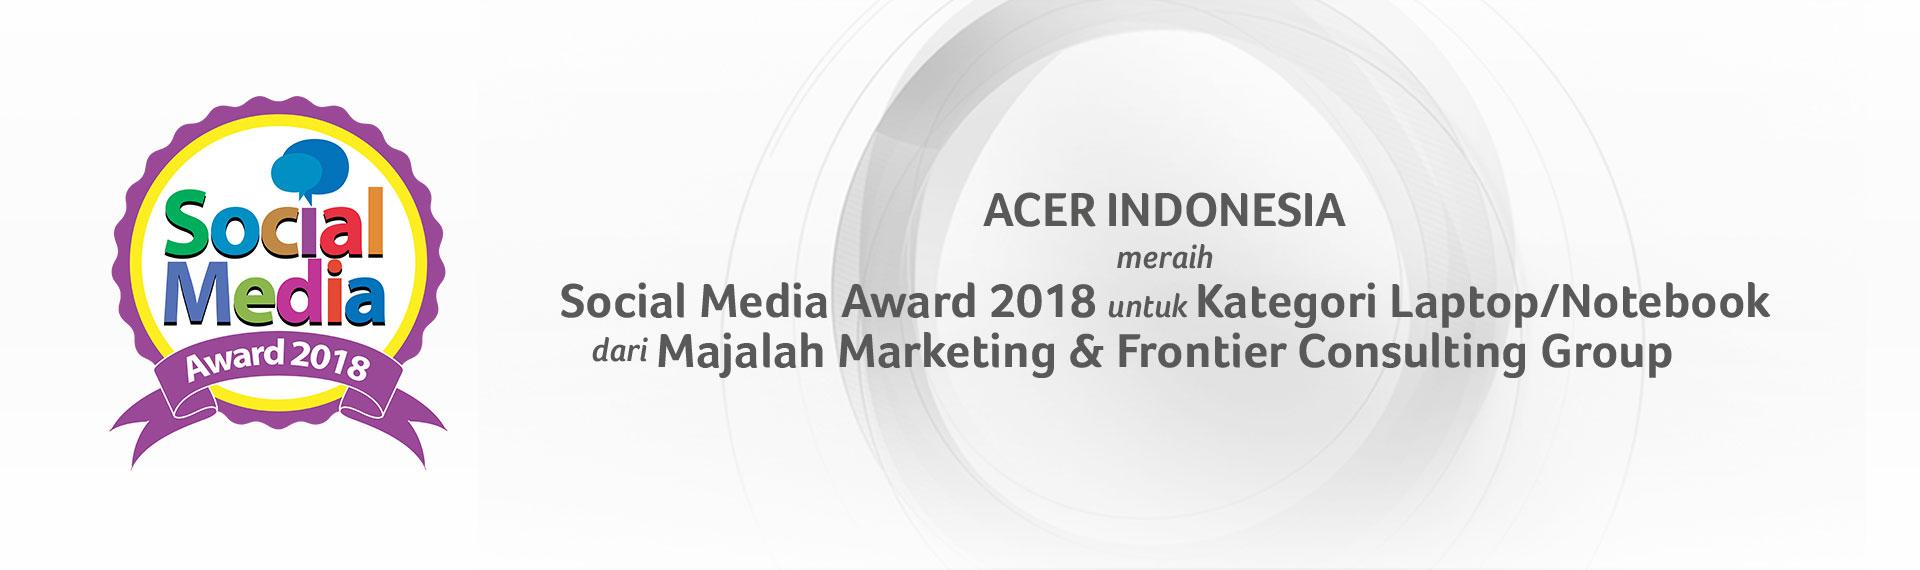 Wow! Social Media Acer Indonesia Dapat Penghargaan Bergengsi!